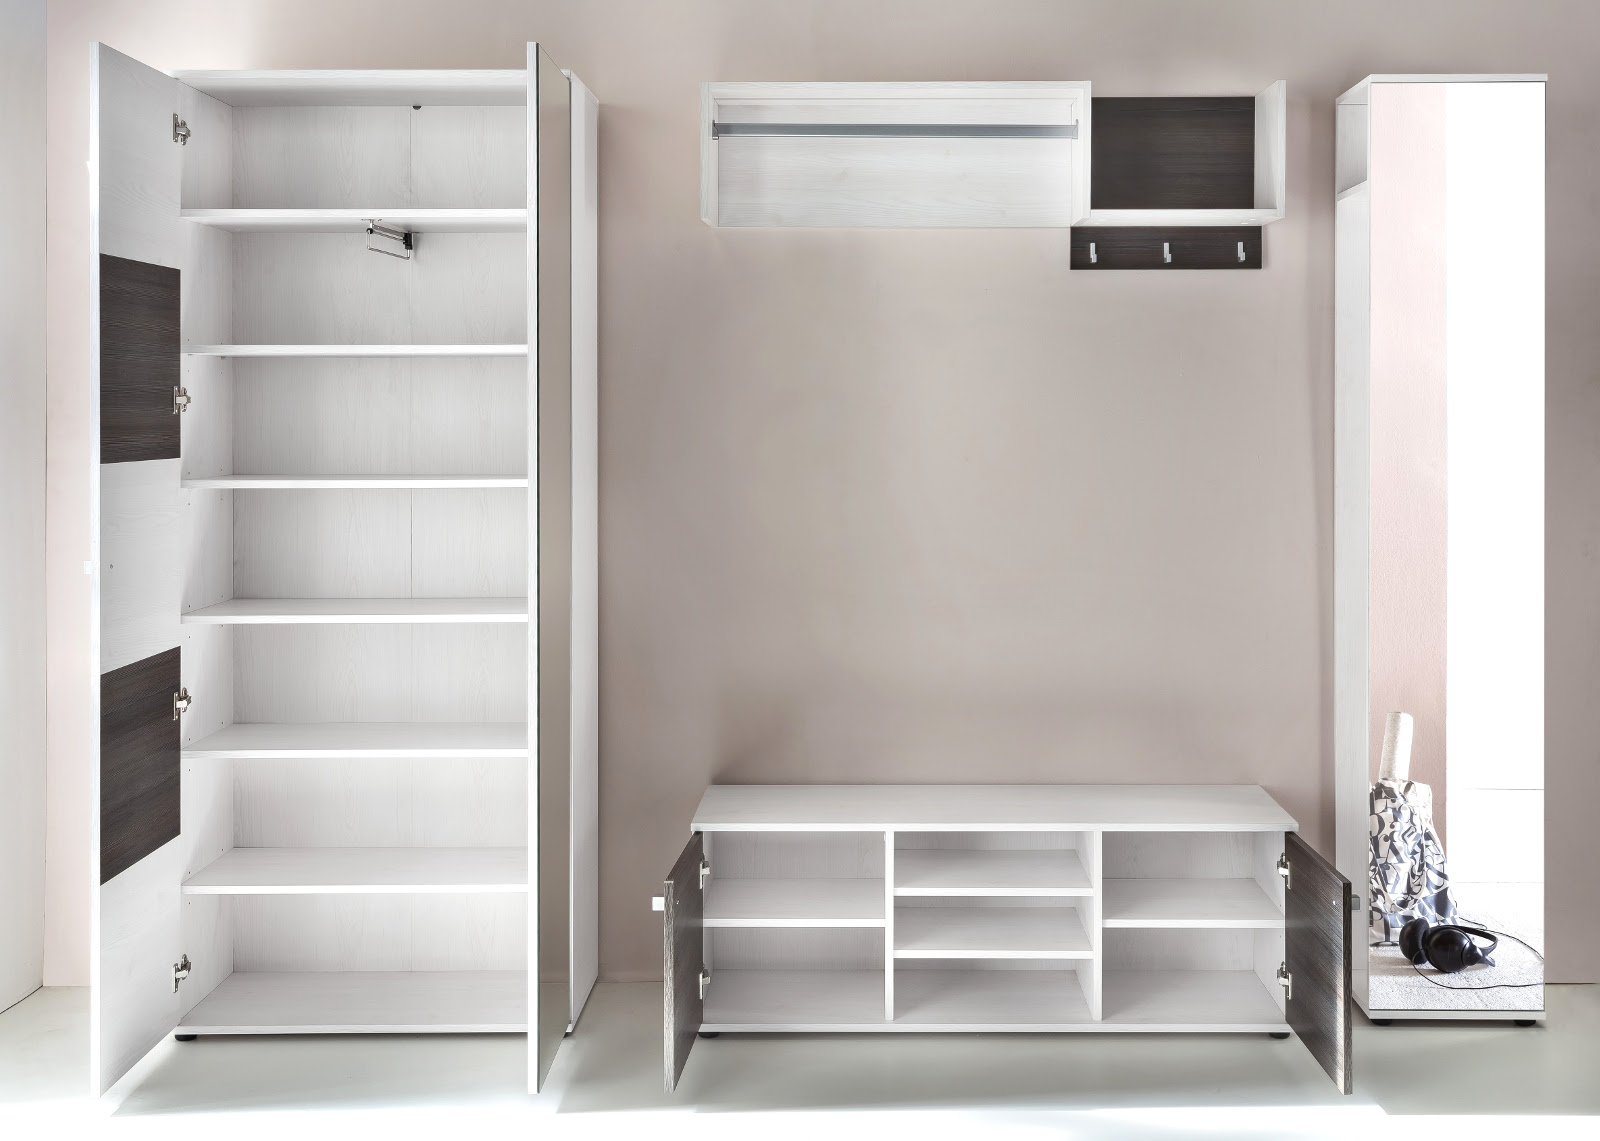 flurgarderobe komplett set wings sibiu l rche wei und. Black Bedroom Furniture Sets. Home Design Ideas